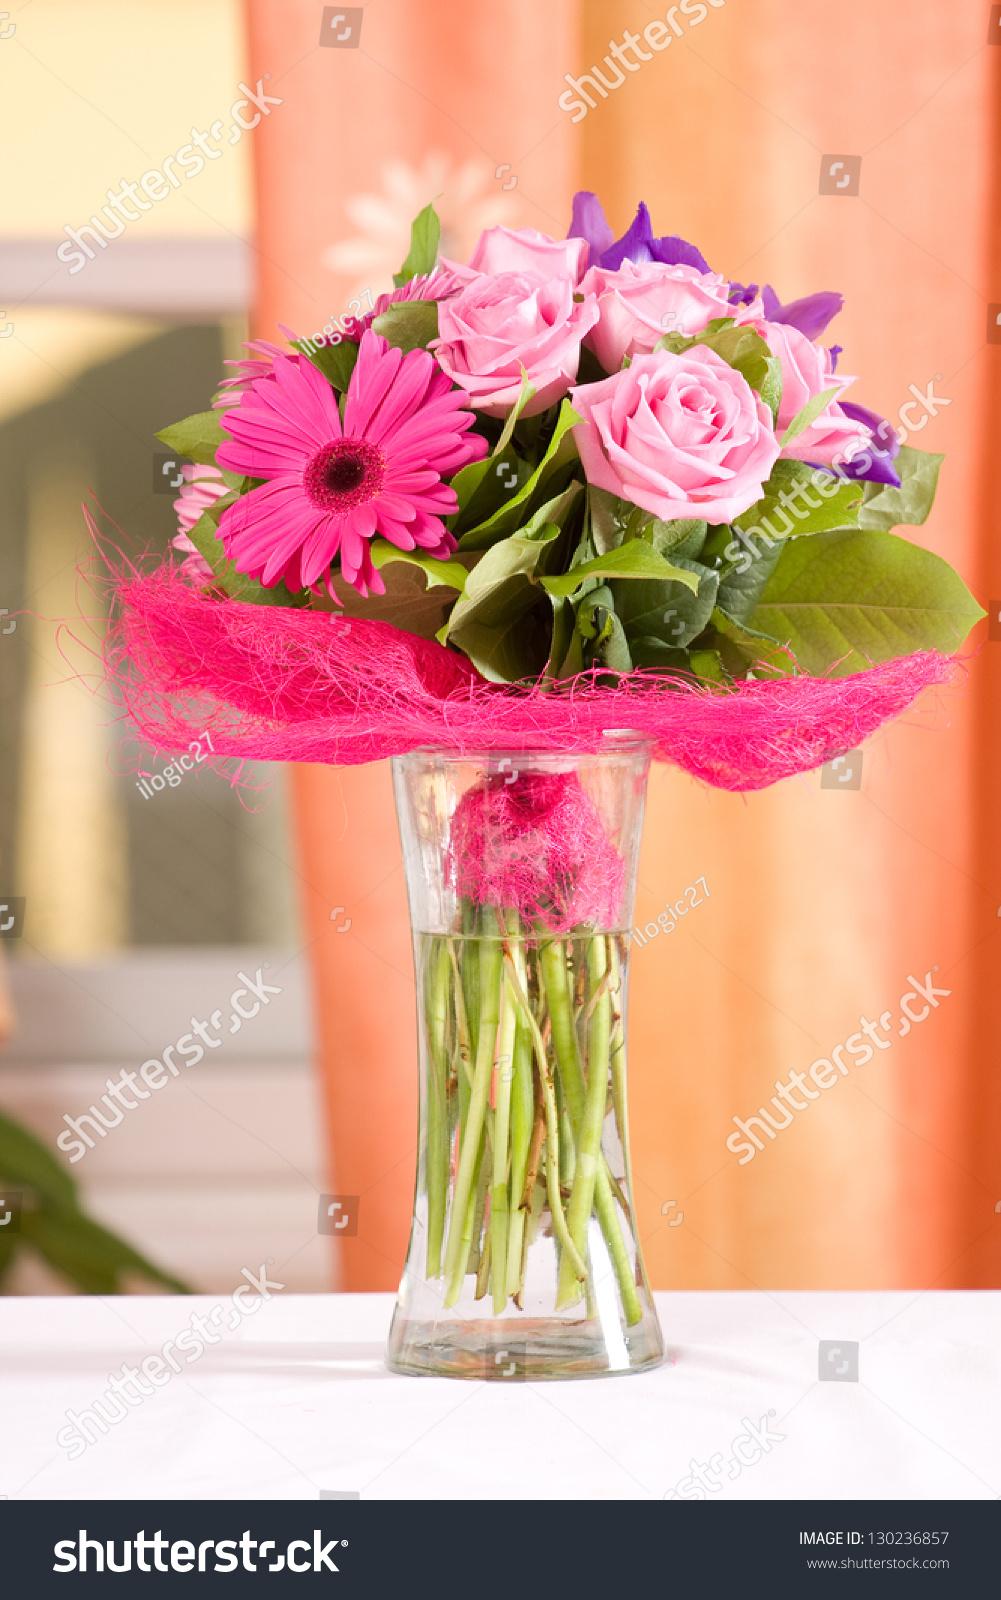 Beautiful flower arrangement vase stock photo edit now 130236857 beautiful flower arrangement in a vase izmirmasajfo